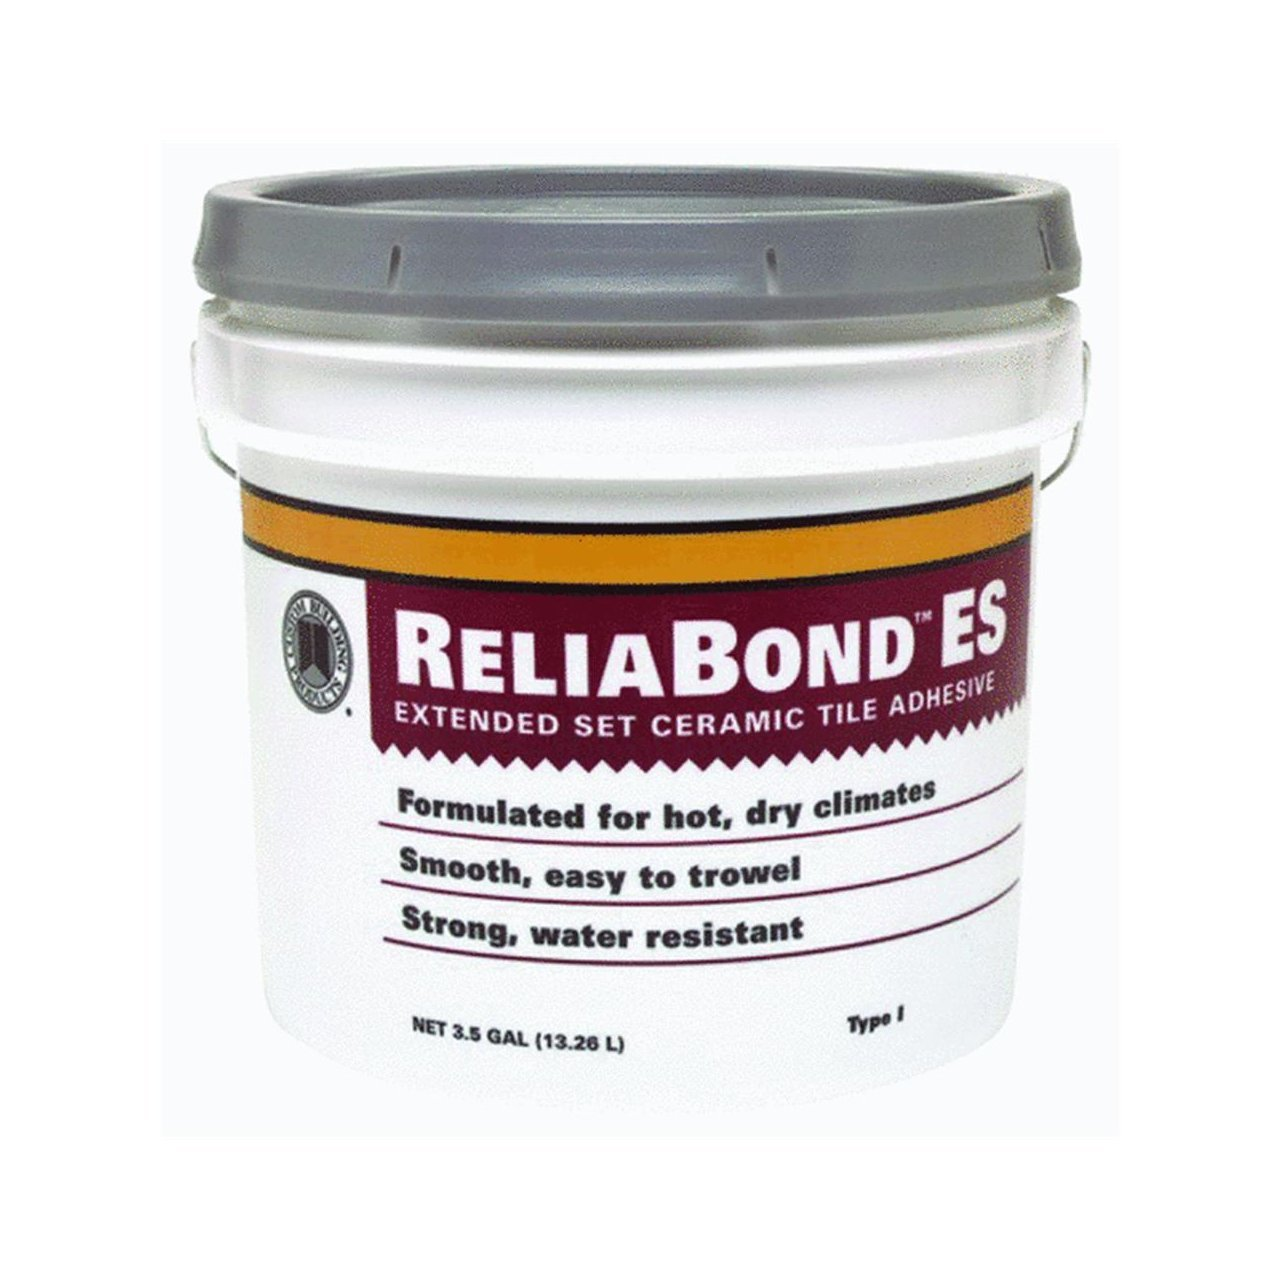 Custom bldg products rbm3es 35 gallon tile adhesive custom bldg products rbm3es 35 gallon tile adhesive multipurpose flooring adhesives amazon dailygadgetfo Choice Image